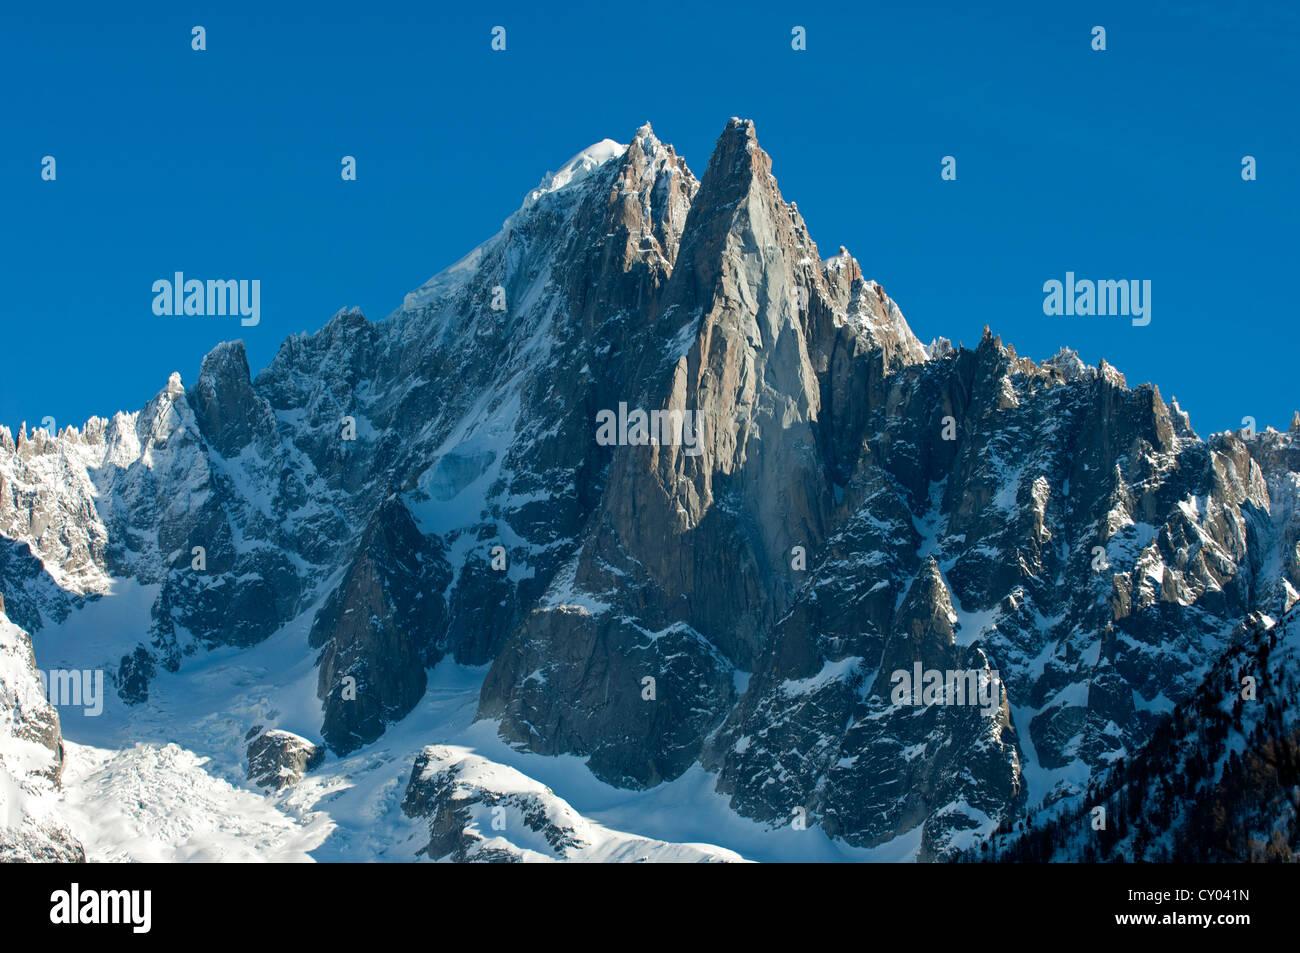 Aiguille Verte peak and Les Druze in winter, Chamonix, Haute Savoie, France, Europe Stock Photo